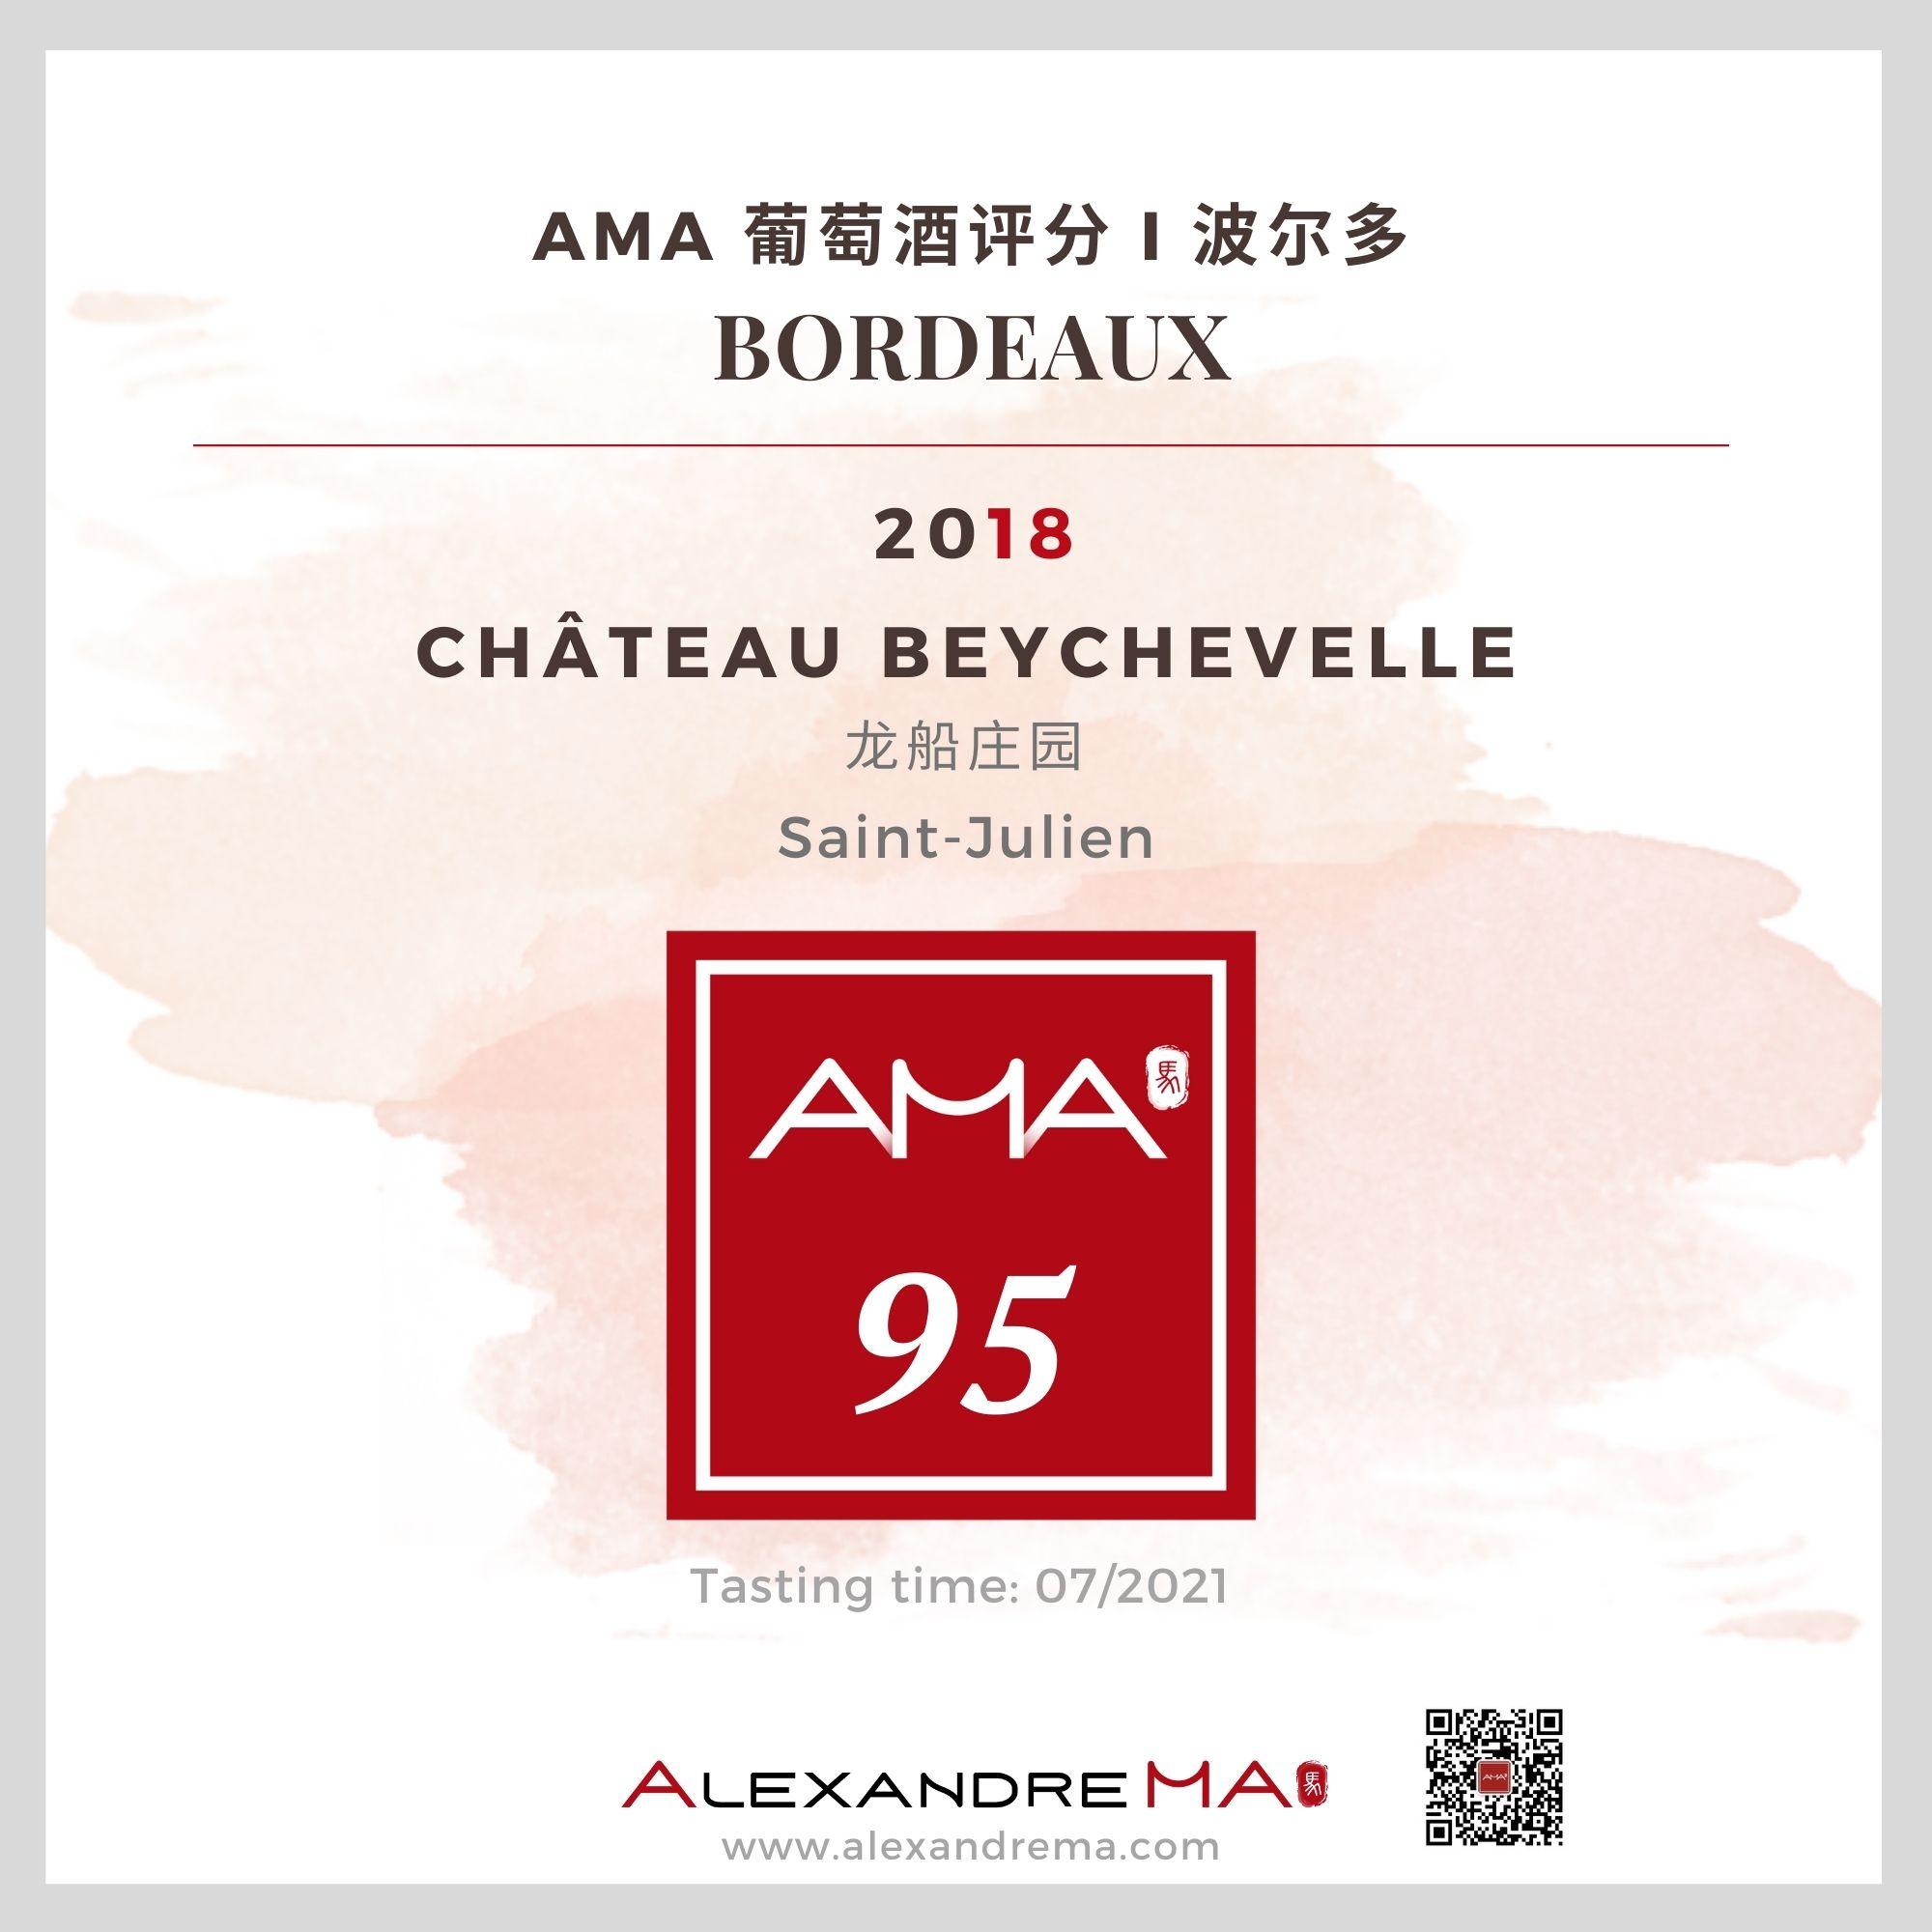 Château Beychevelle 2018 - Alexandre MA